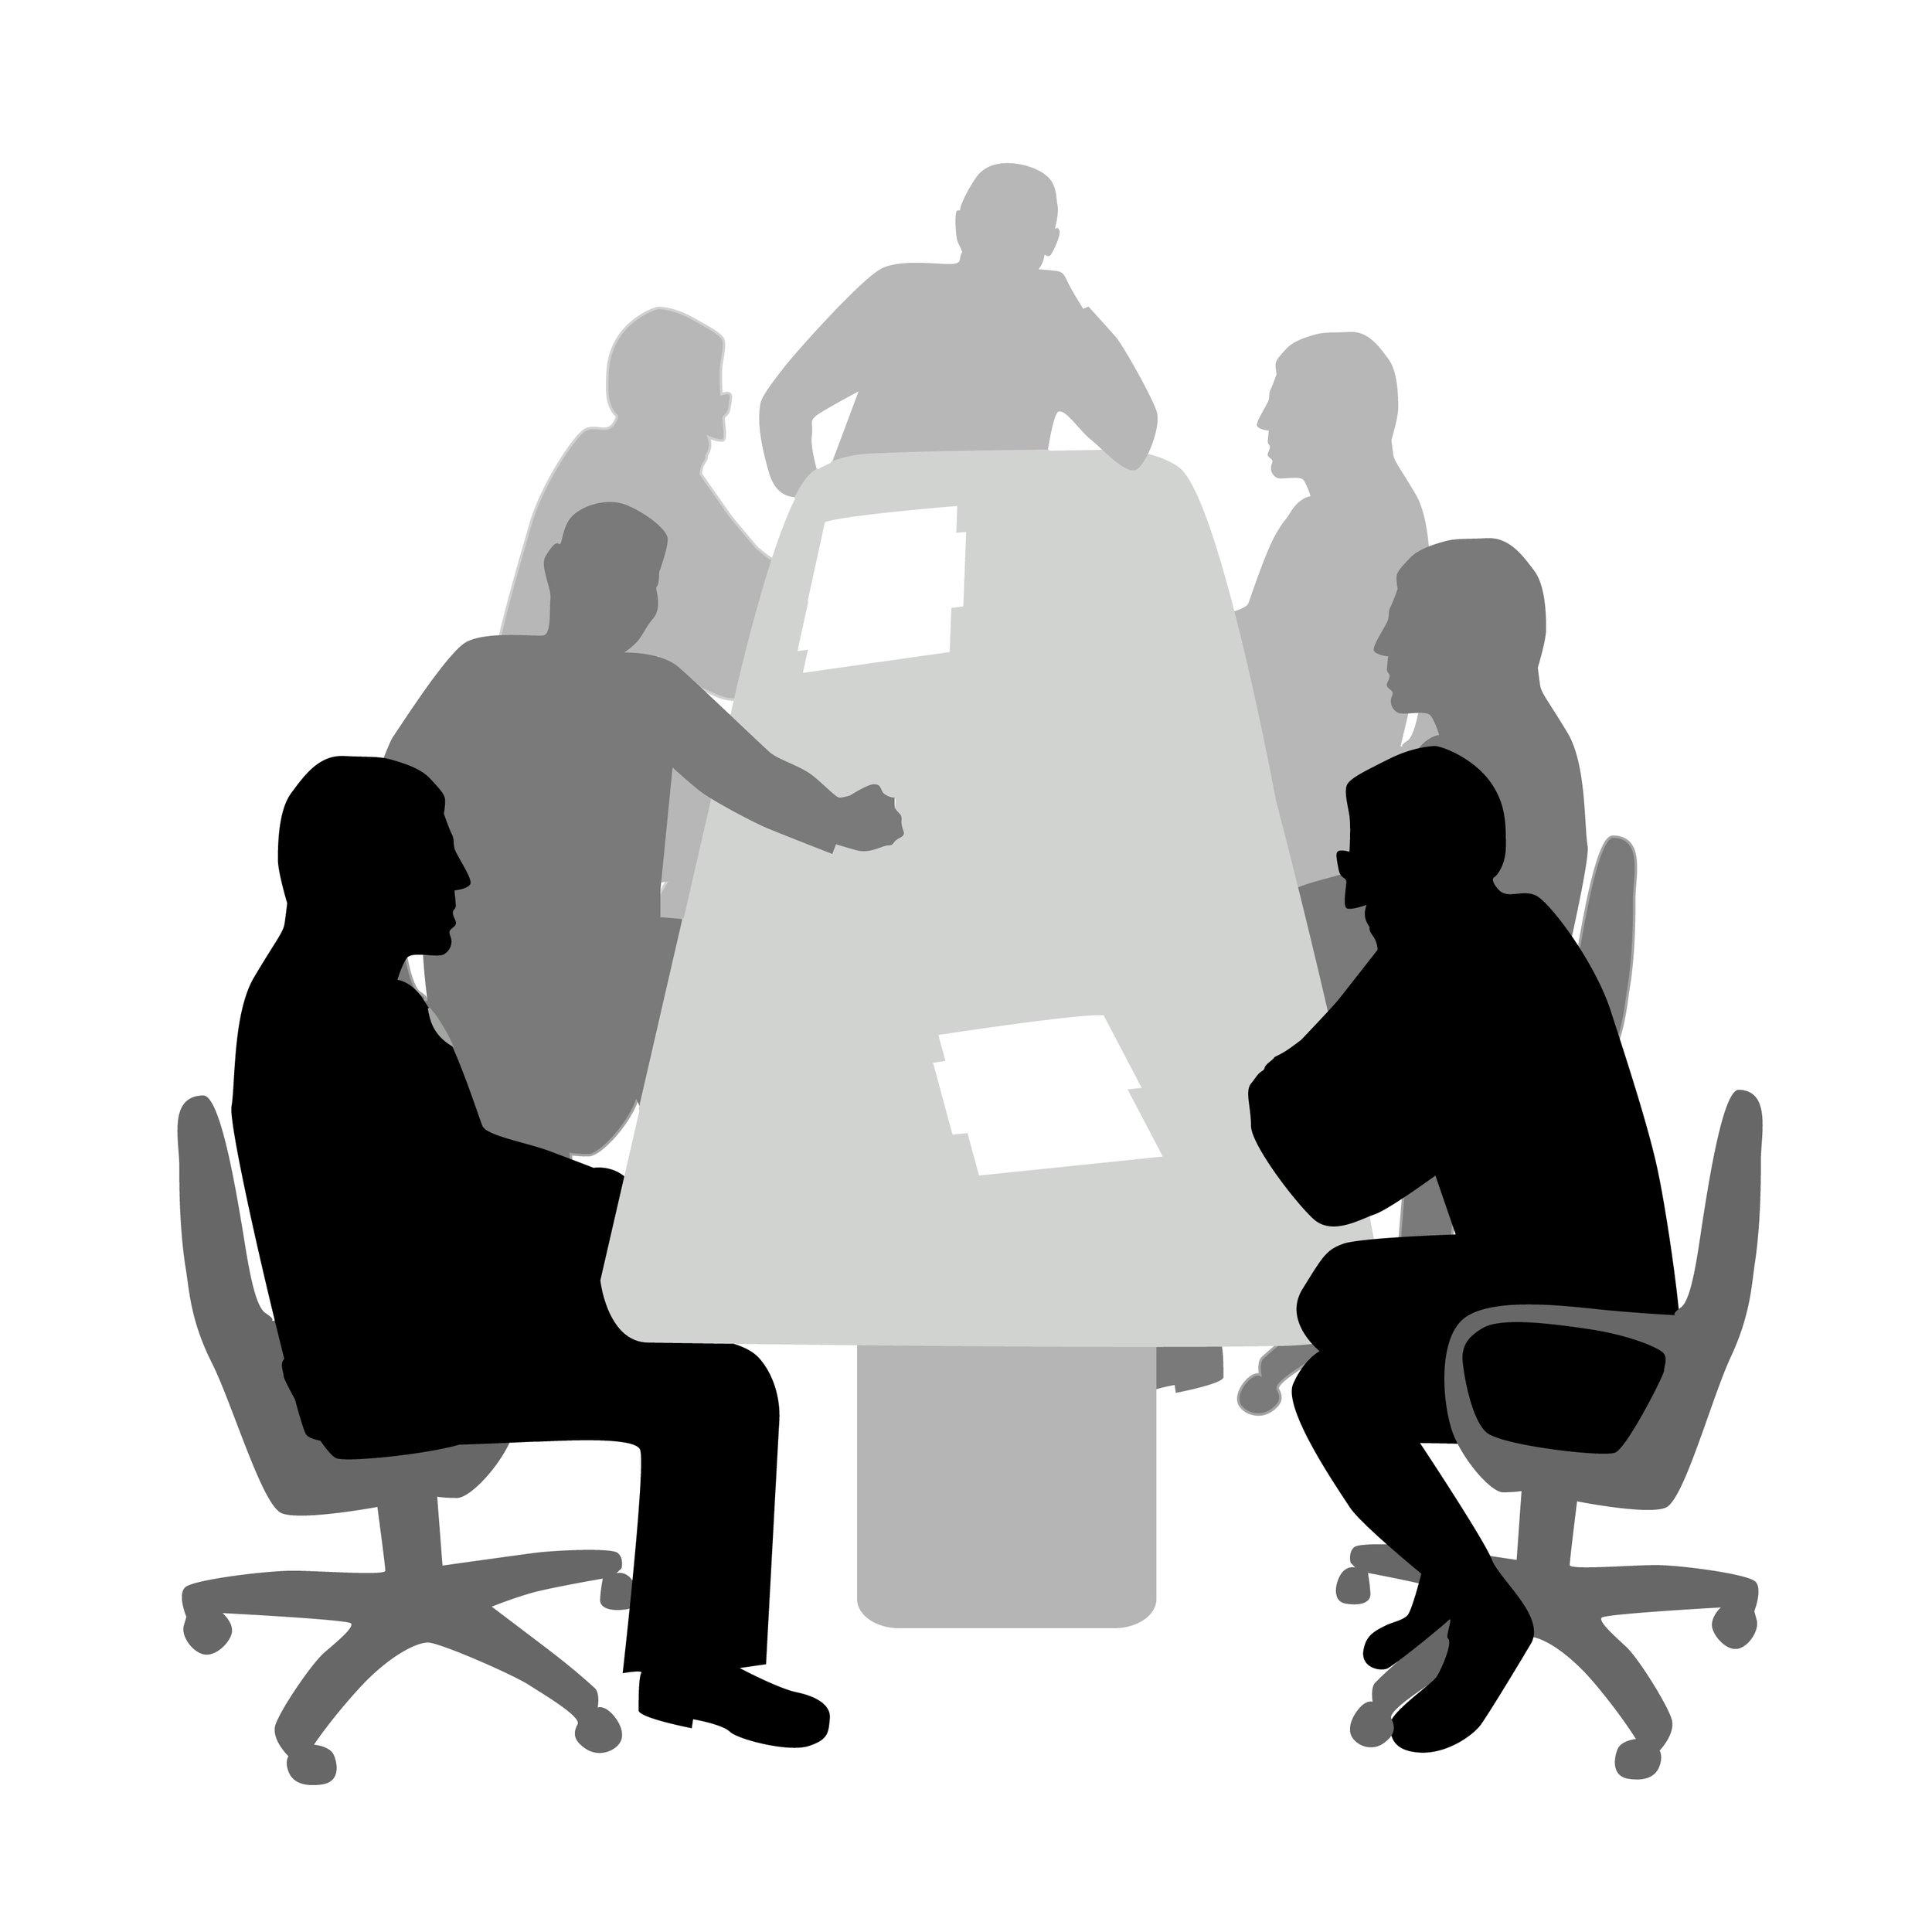 Board-Meeting-Black-White